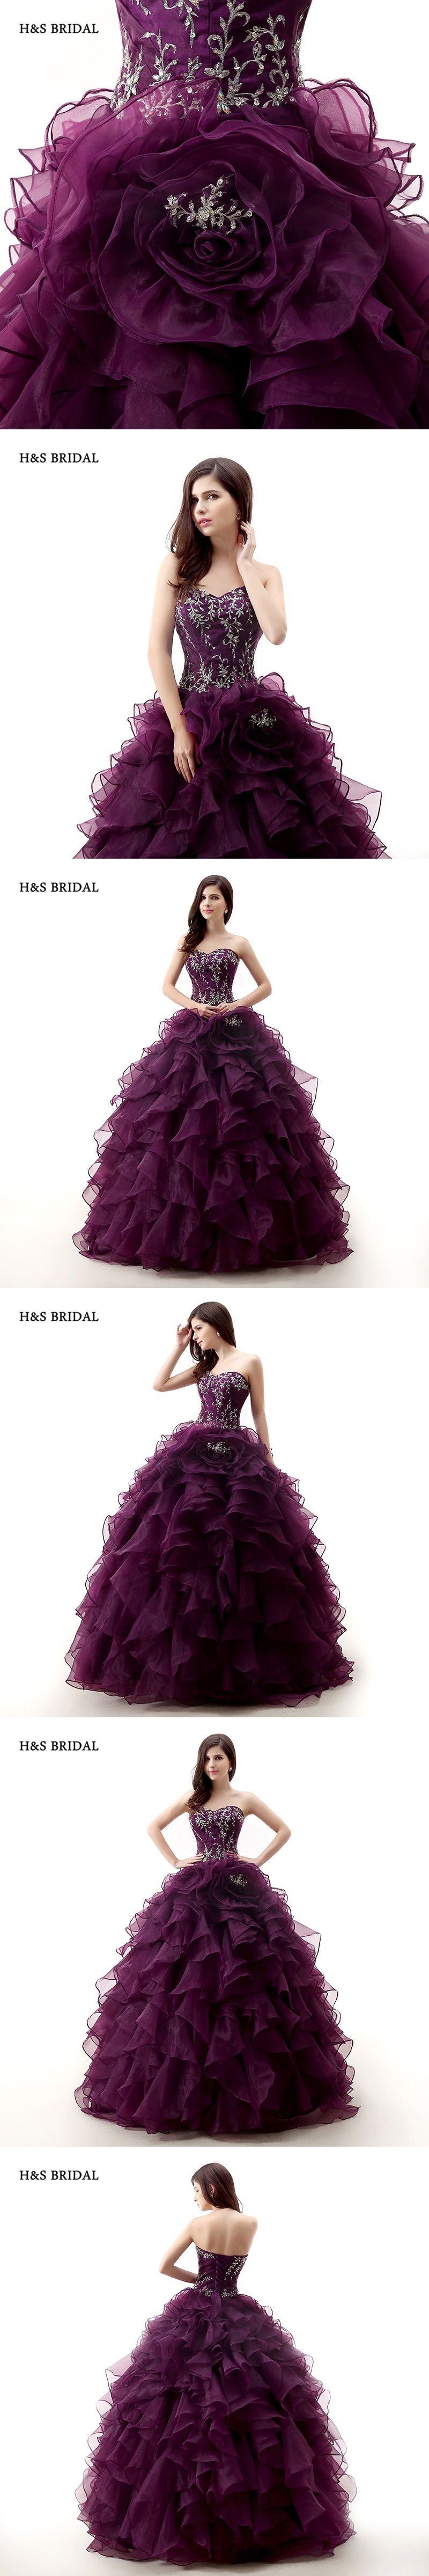 Hus bridal dark purple rose organza ball gown prom dresses